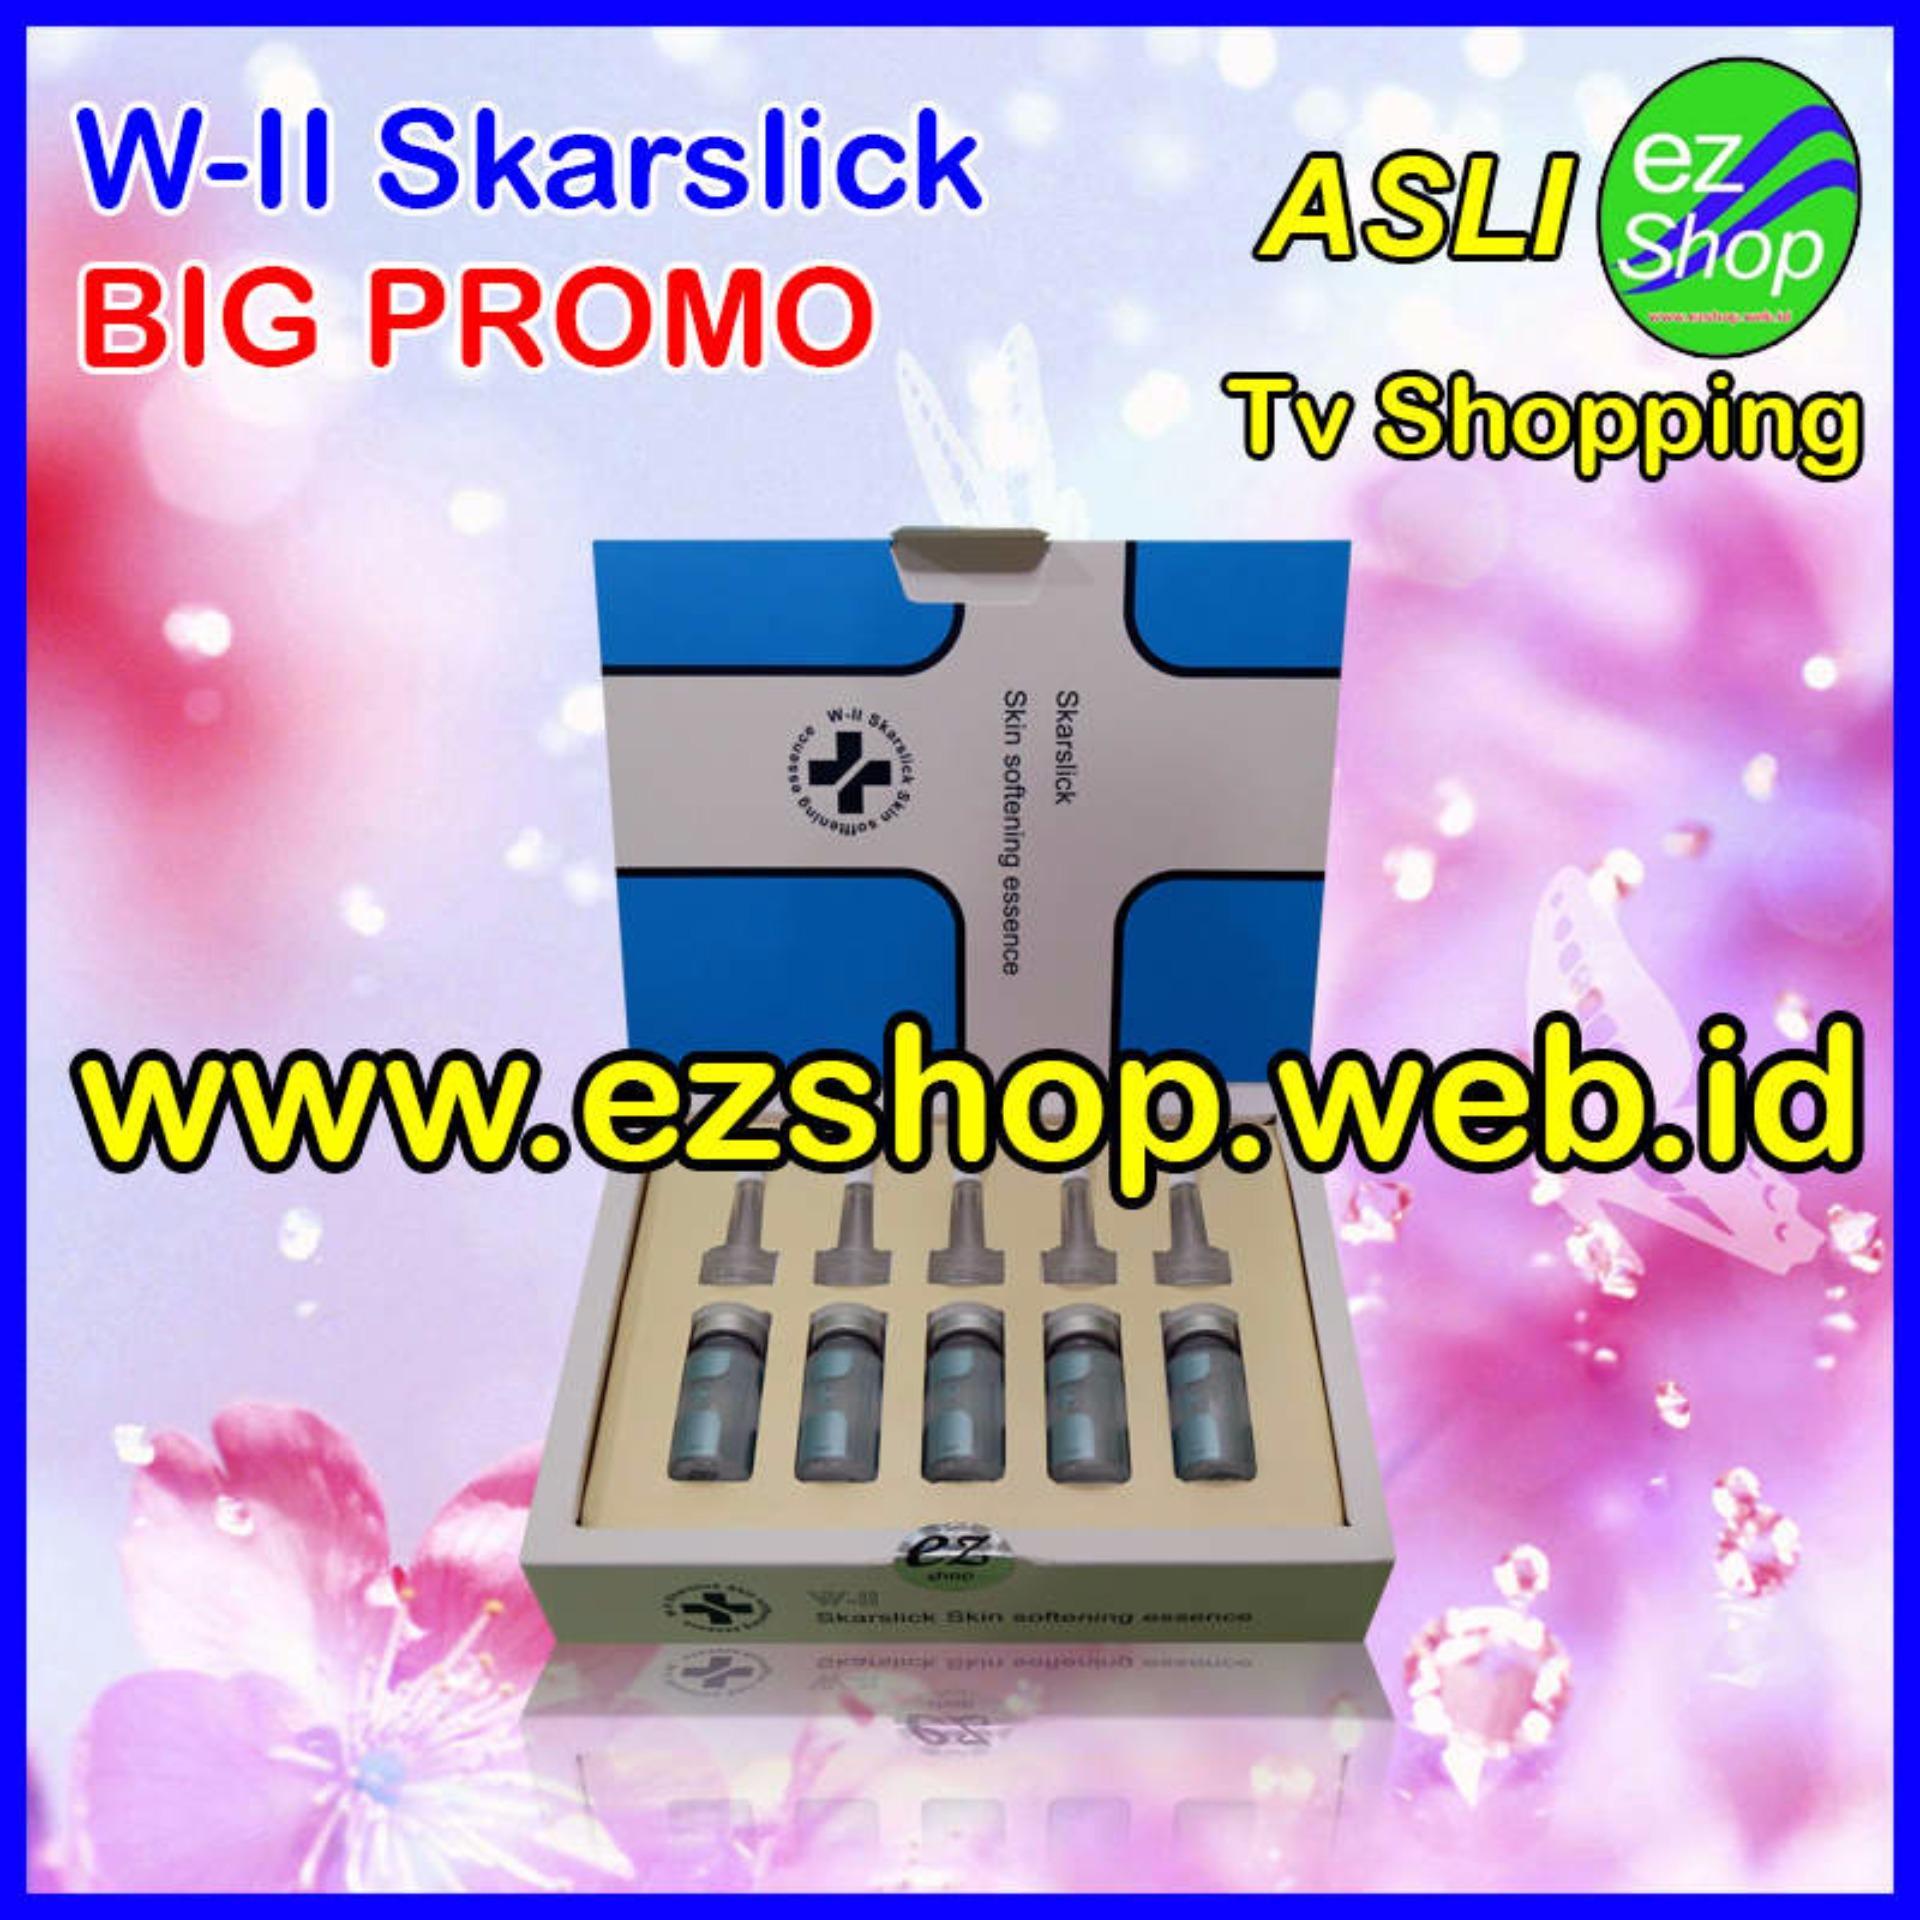 W-II Skarslick Skin Softening Essence - Serum / Obat PenghilangBekas Luka Alami (Skar Slick) - Jaminan Asli EzShop - Ez Shop TvHome Shopping Indonesia